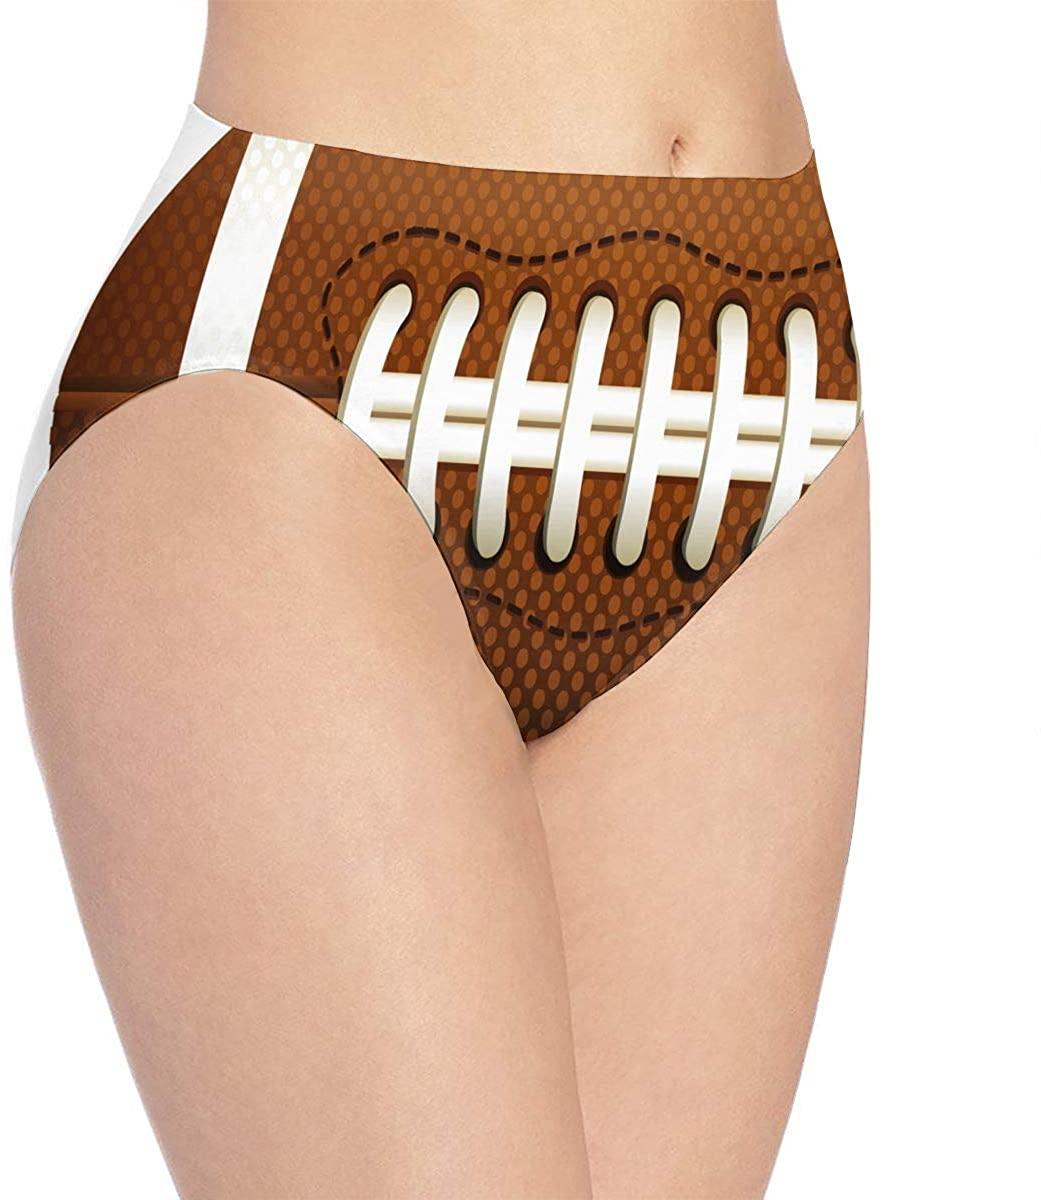 yujiasuliao Womens Underwear Football Ground Vector Special Bikini Brief Hipster Panty